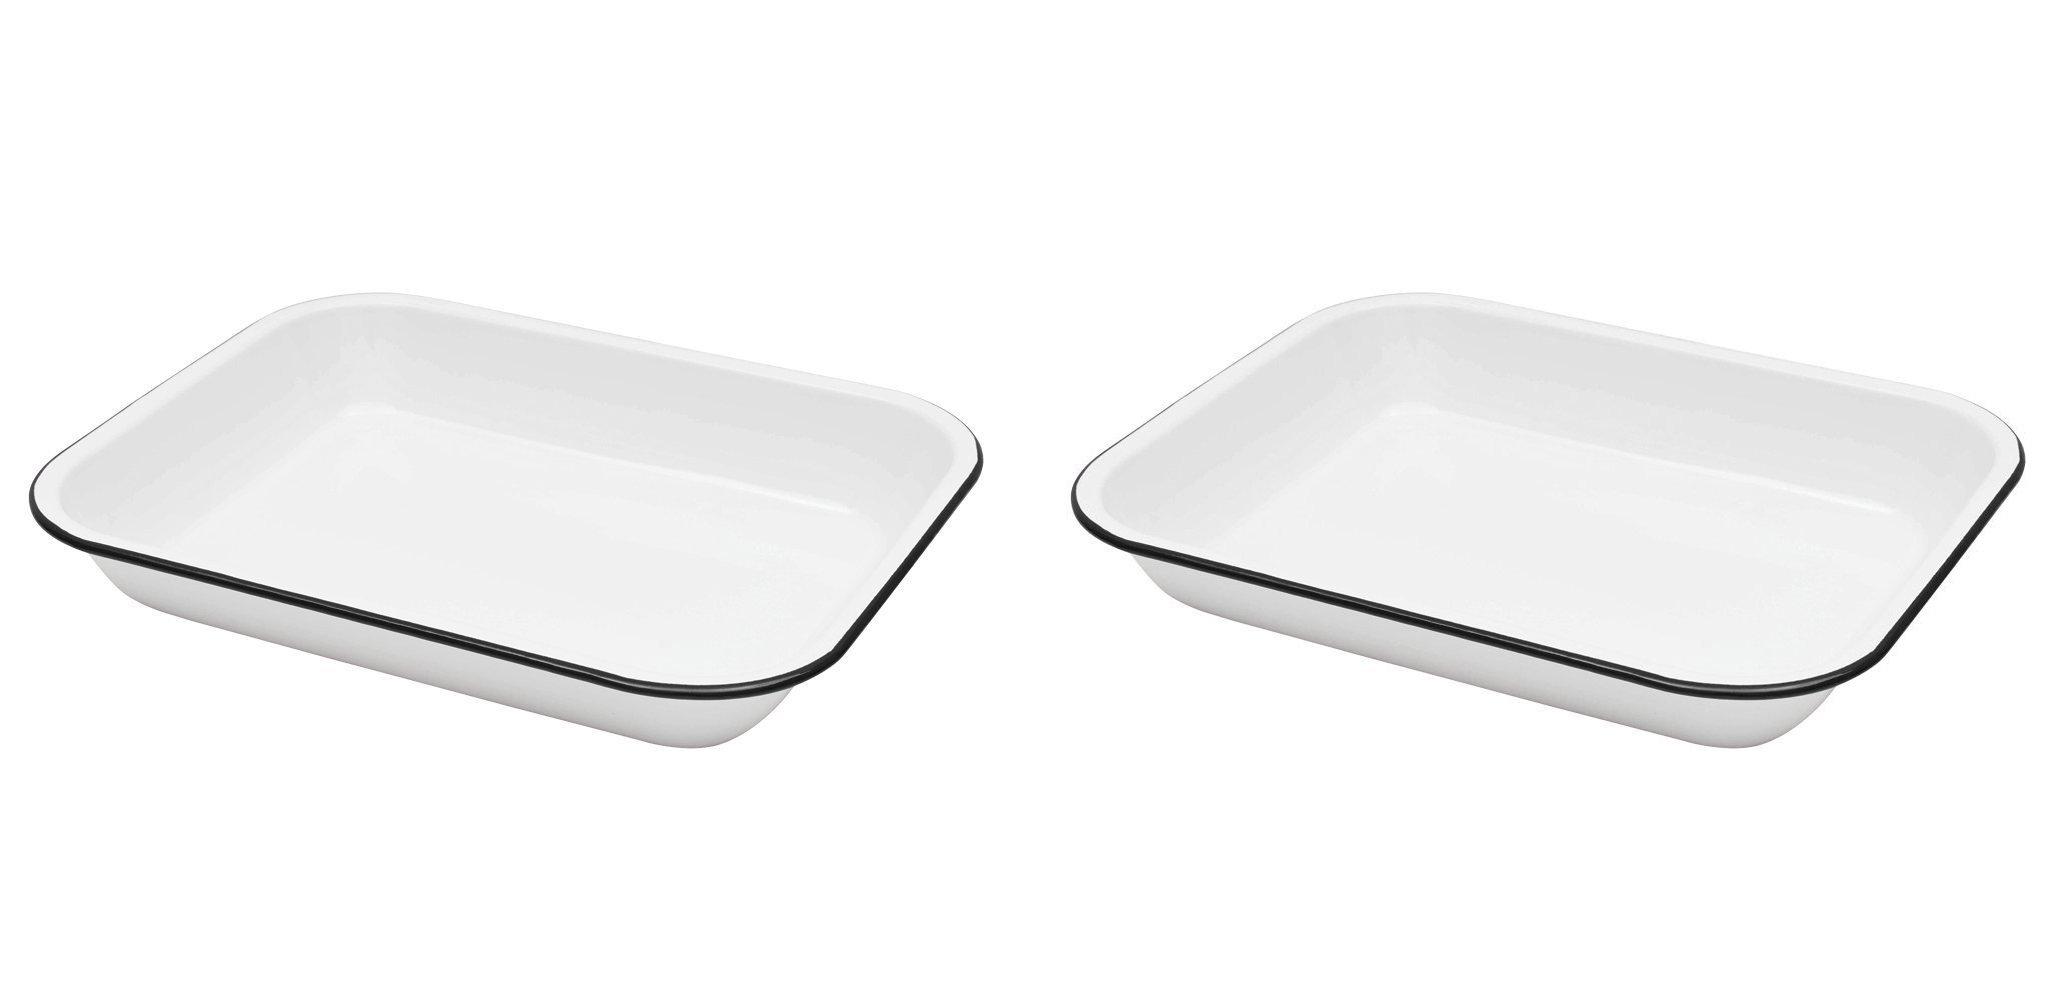 Crow Canyon - Set of 2 Enamelware Large 3 Quart Roasting Pans (White with Black Rim)